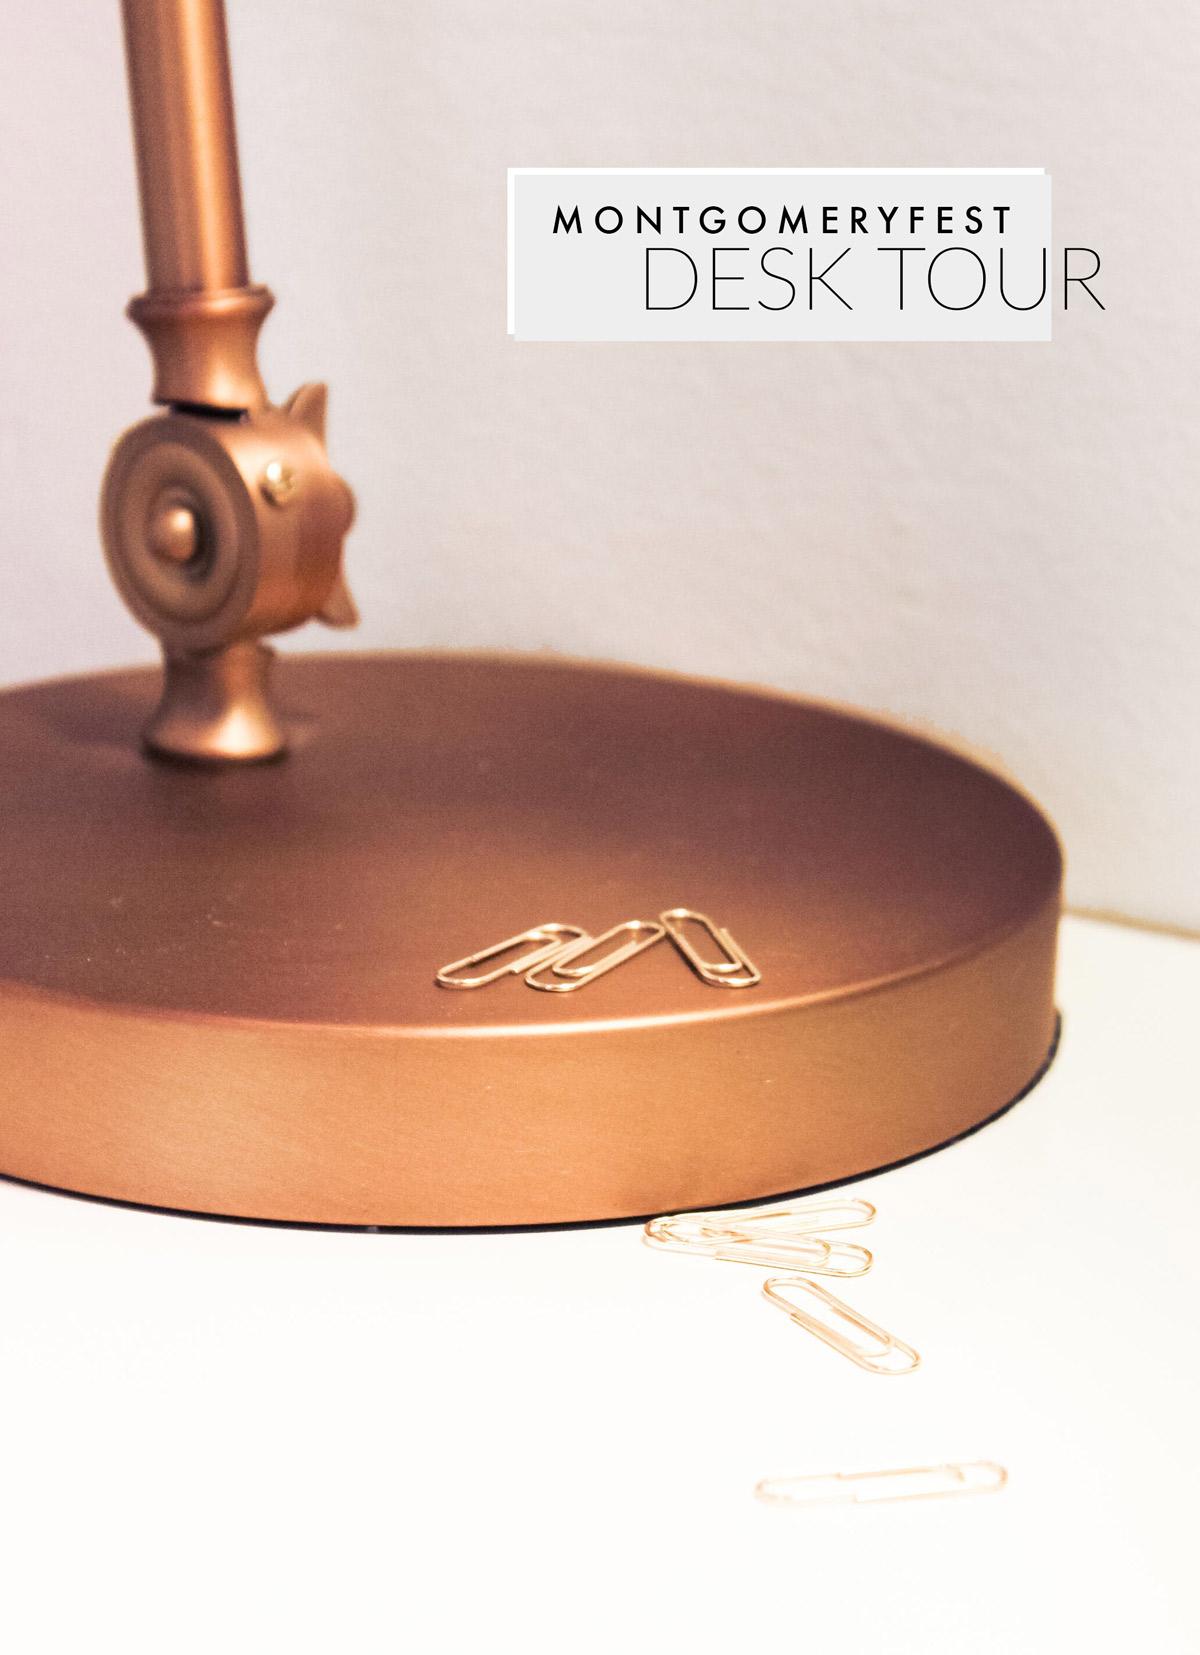 gold-lamp-desk-tour-graphic.jpg